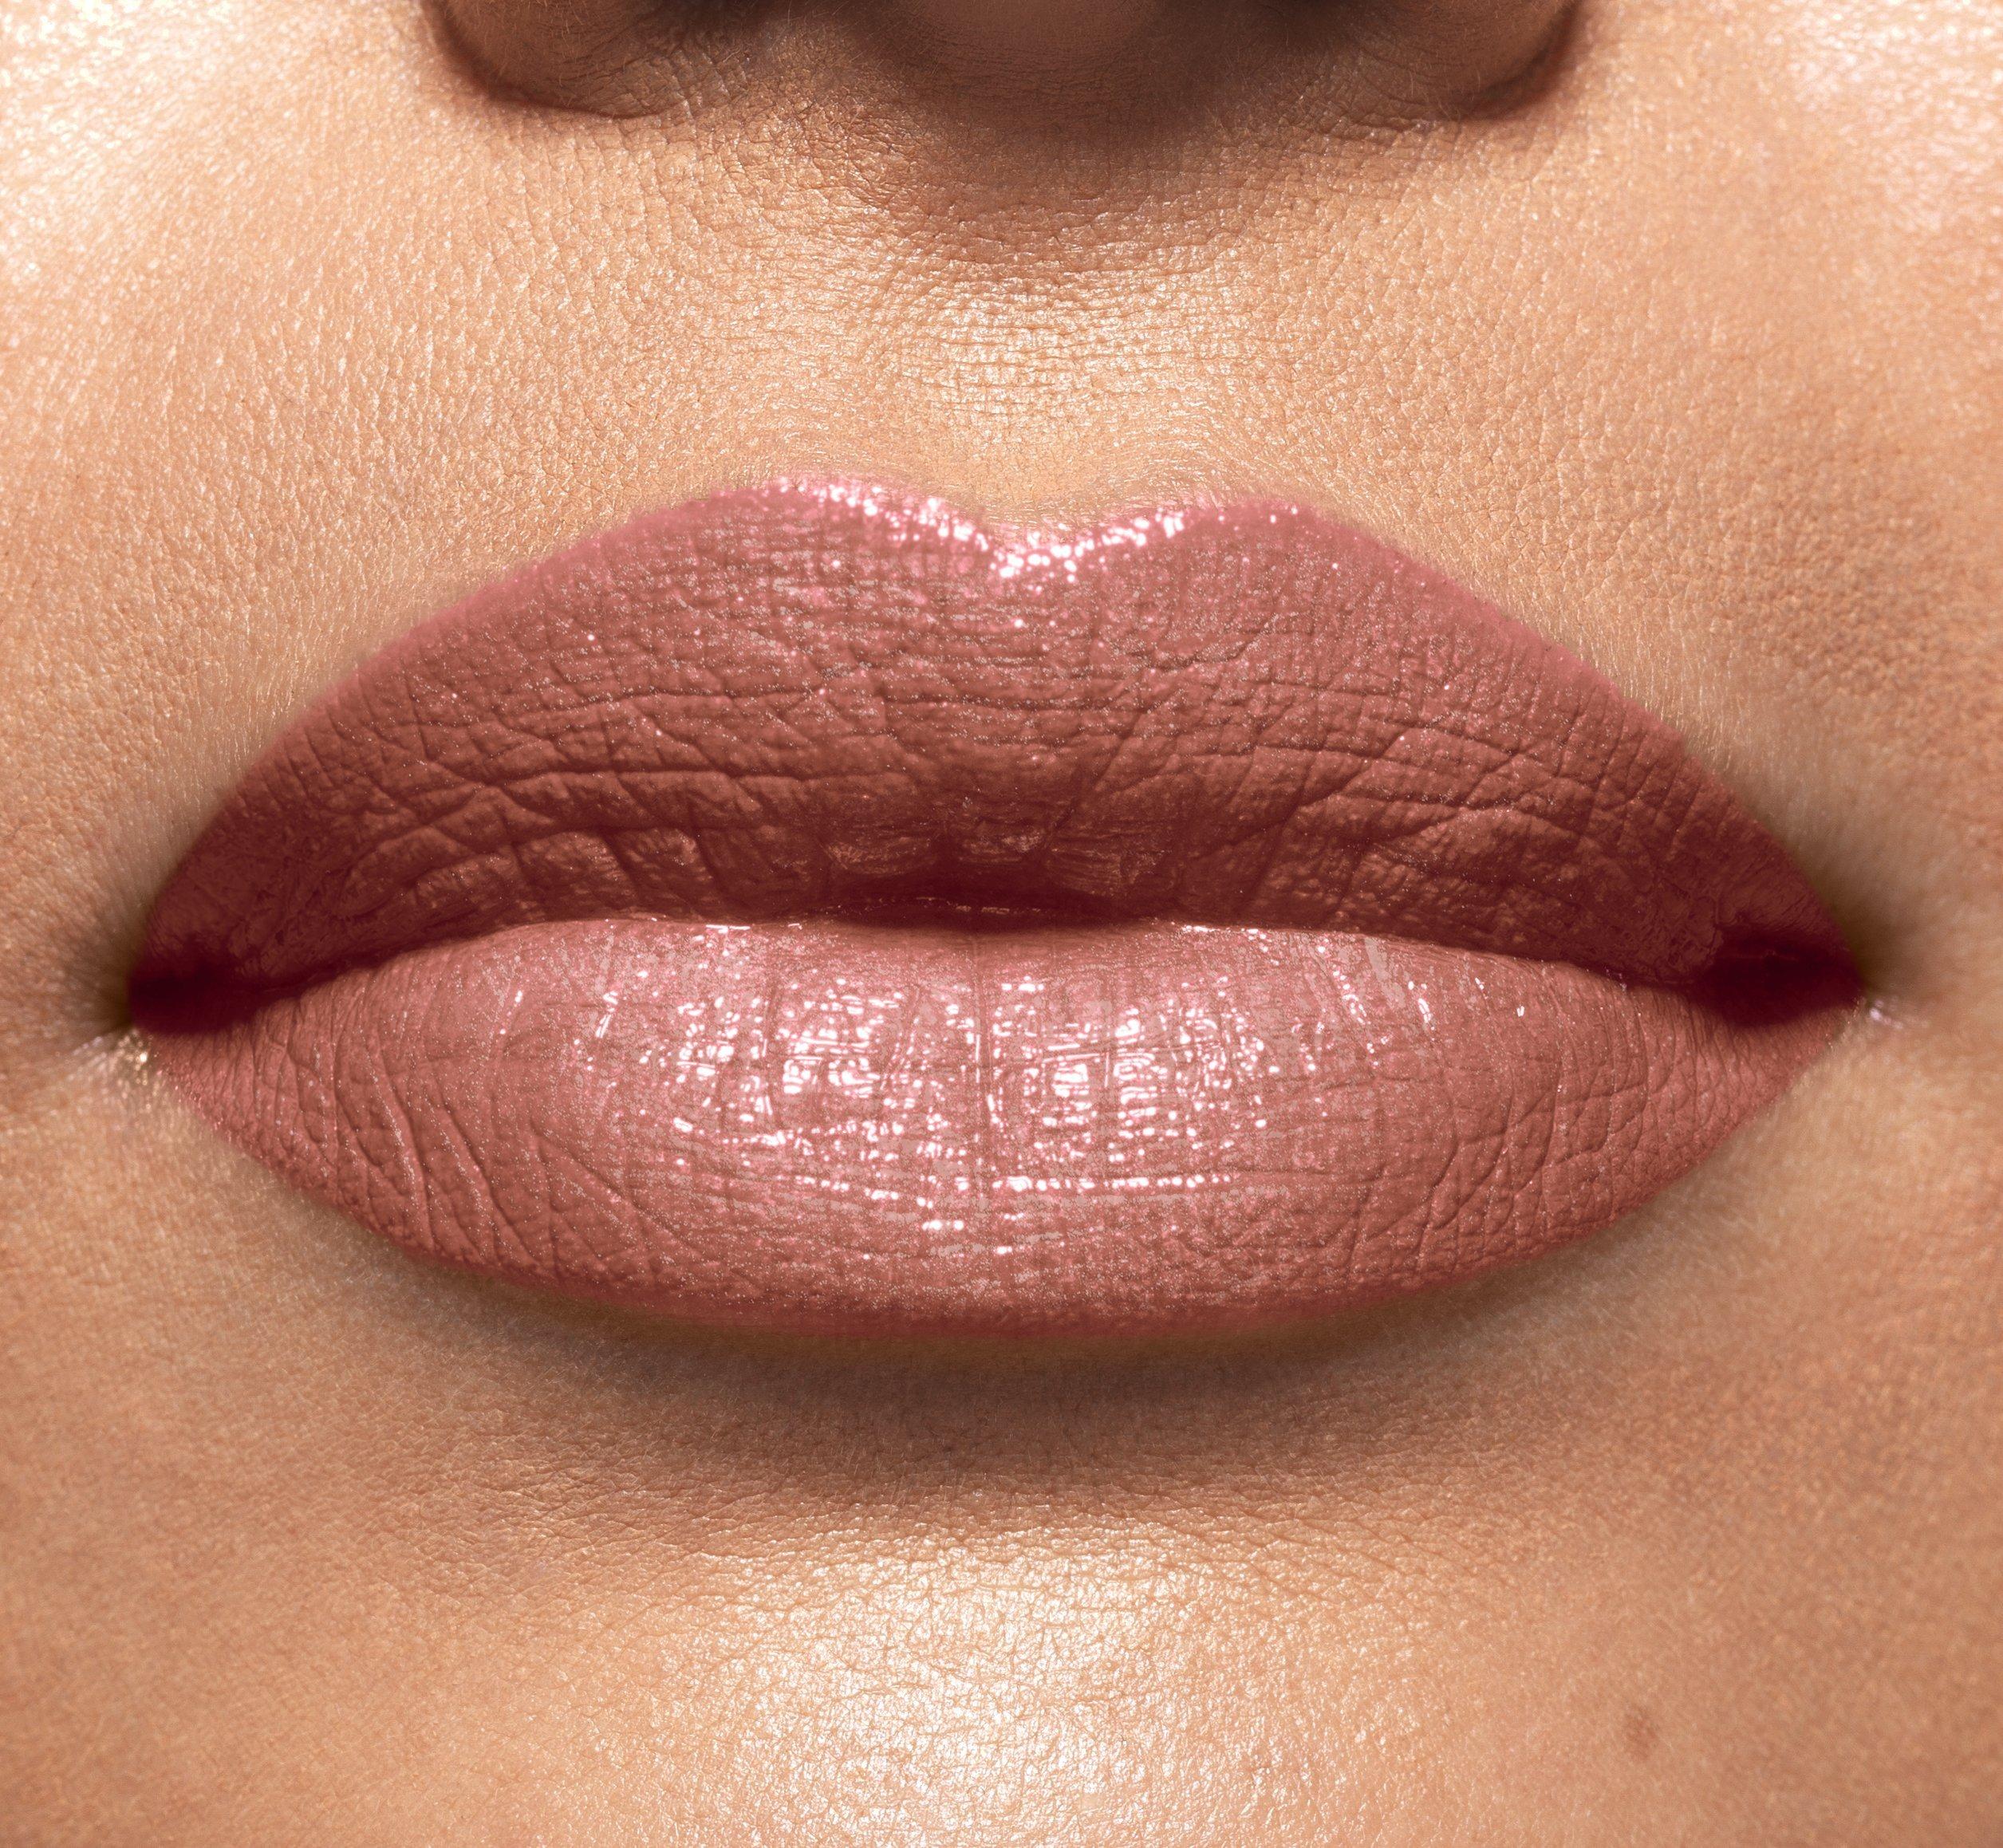 L'Oréal Paris Color Riche Barra de Labios 233 – barras de labios (Naranja, Taffeta)